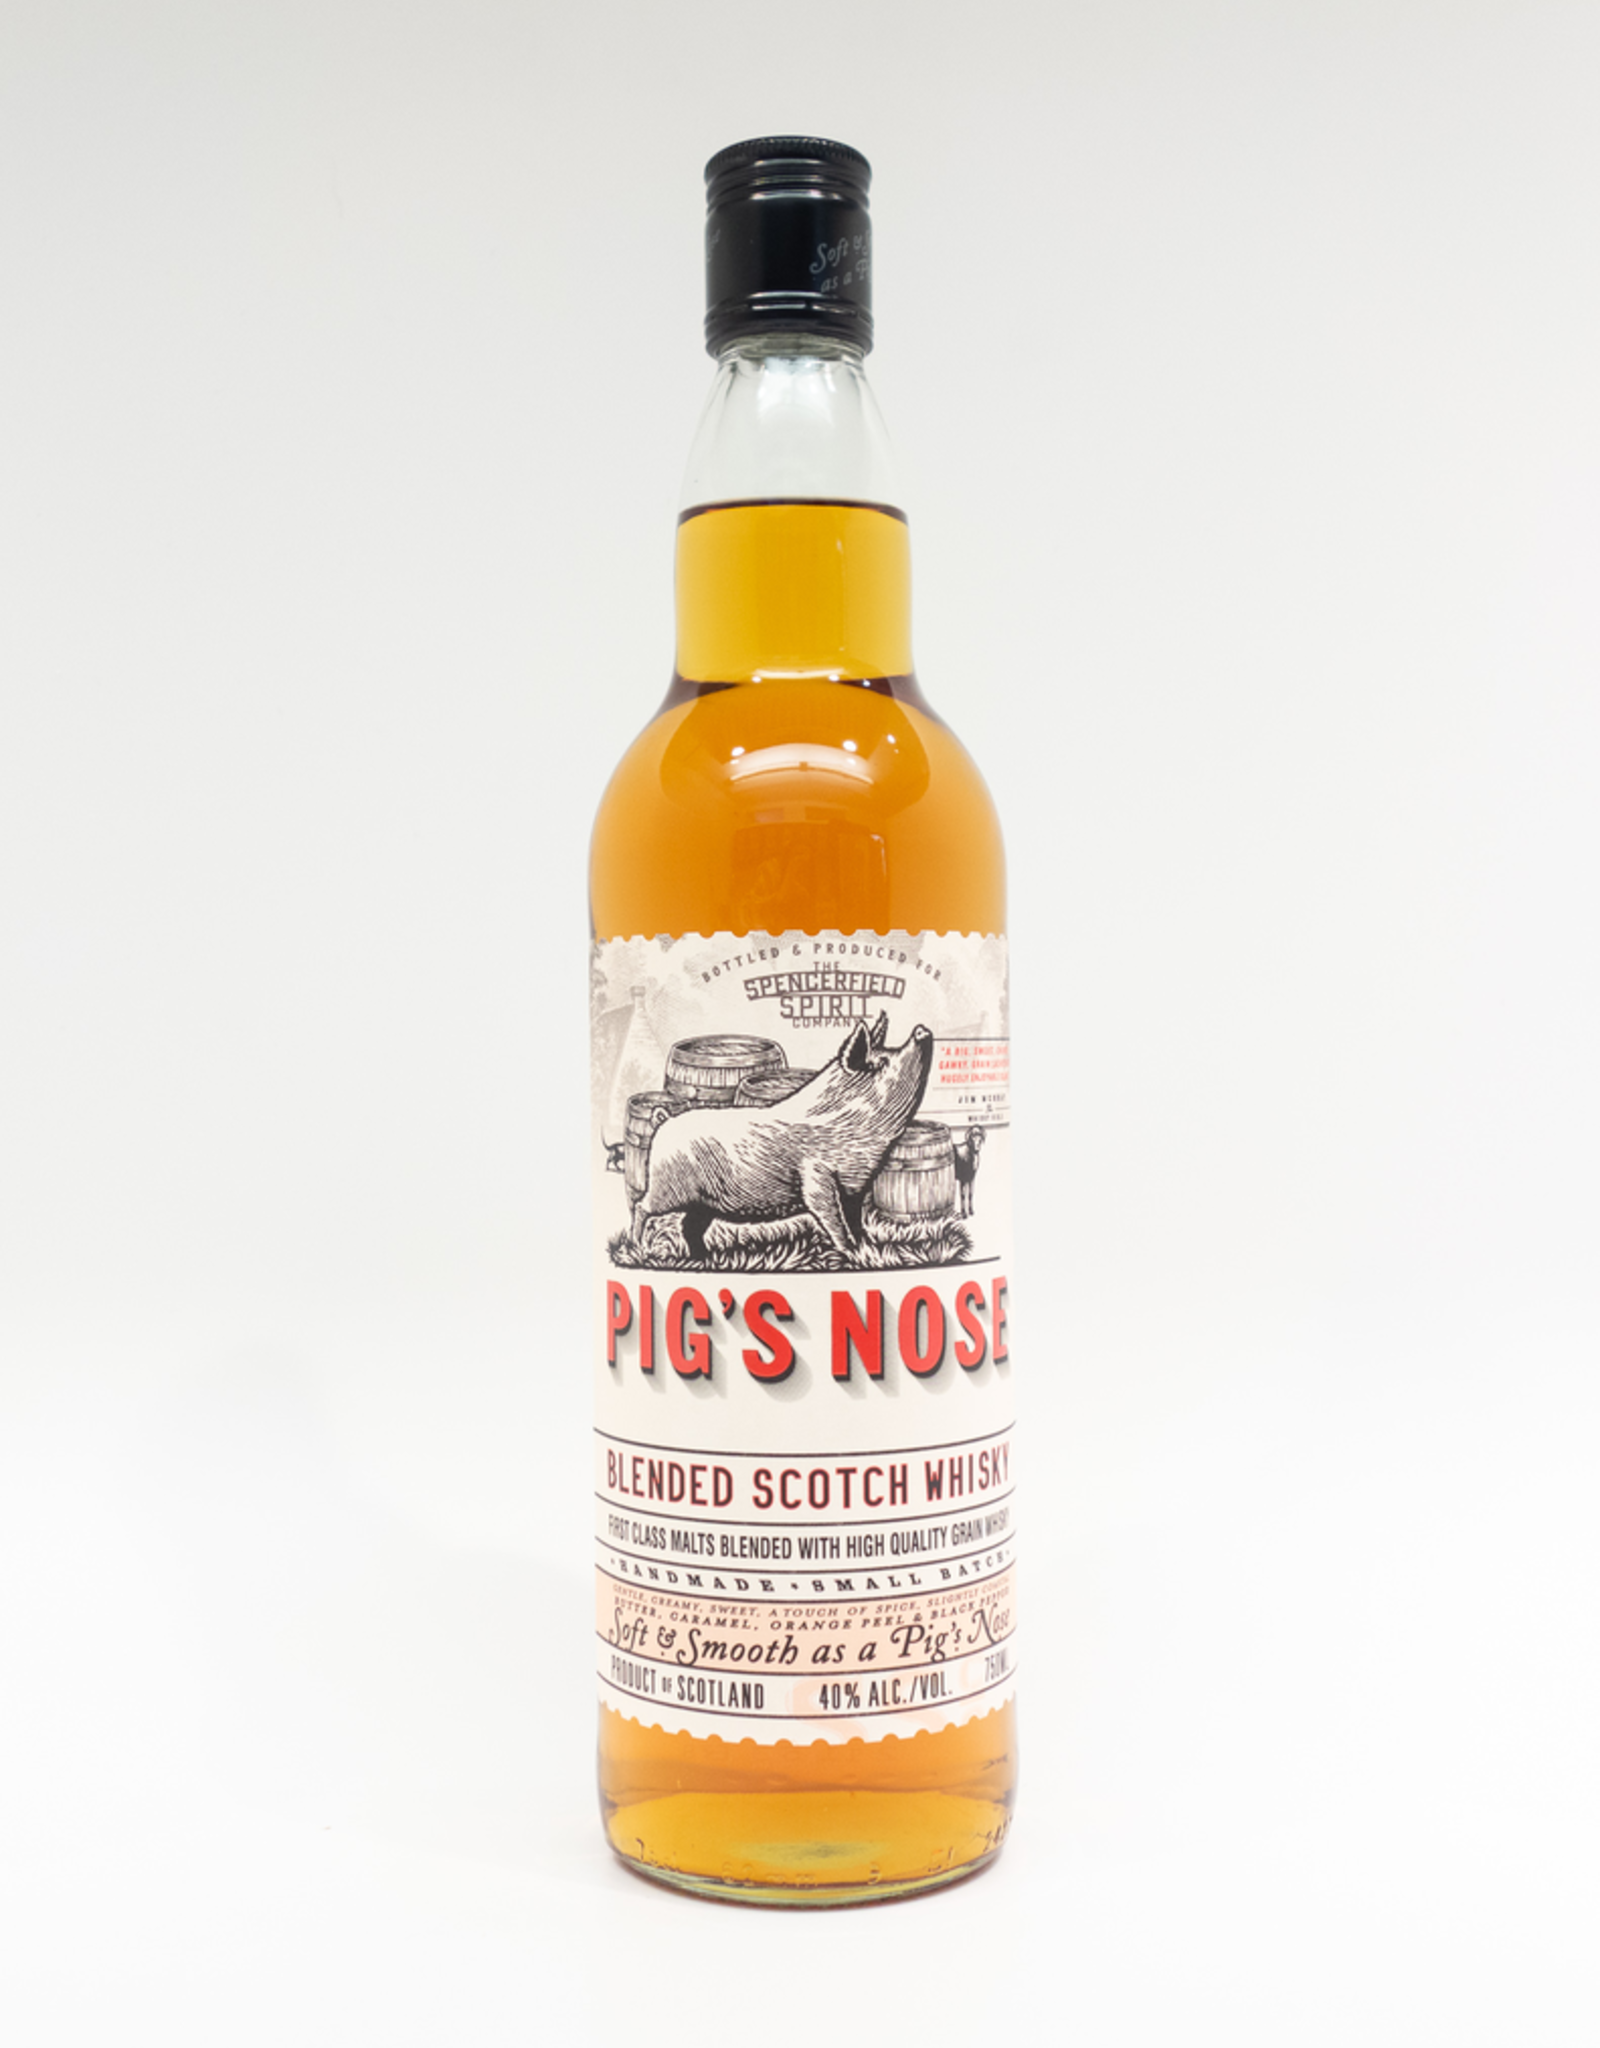 Spirits-Whiskey-Scotch-Blended Pig's Nose Blended Scotch Whisky 750ml